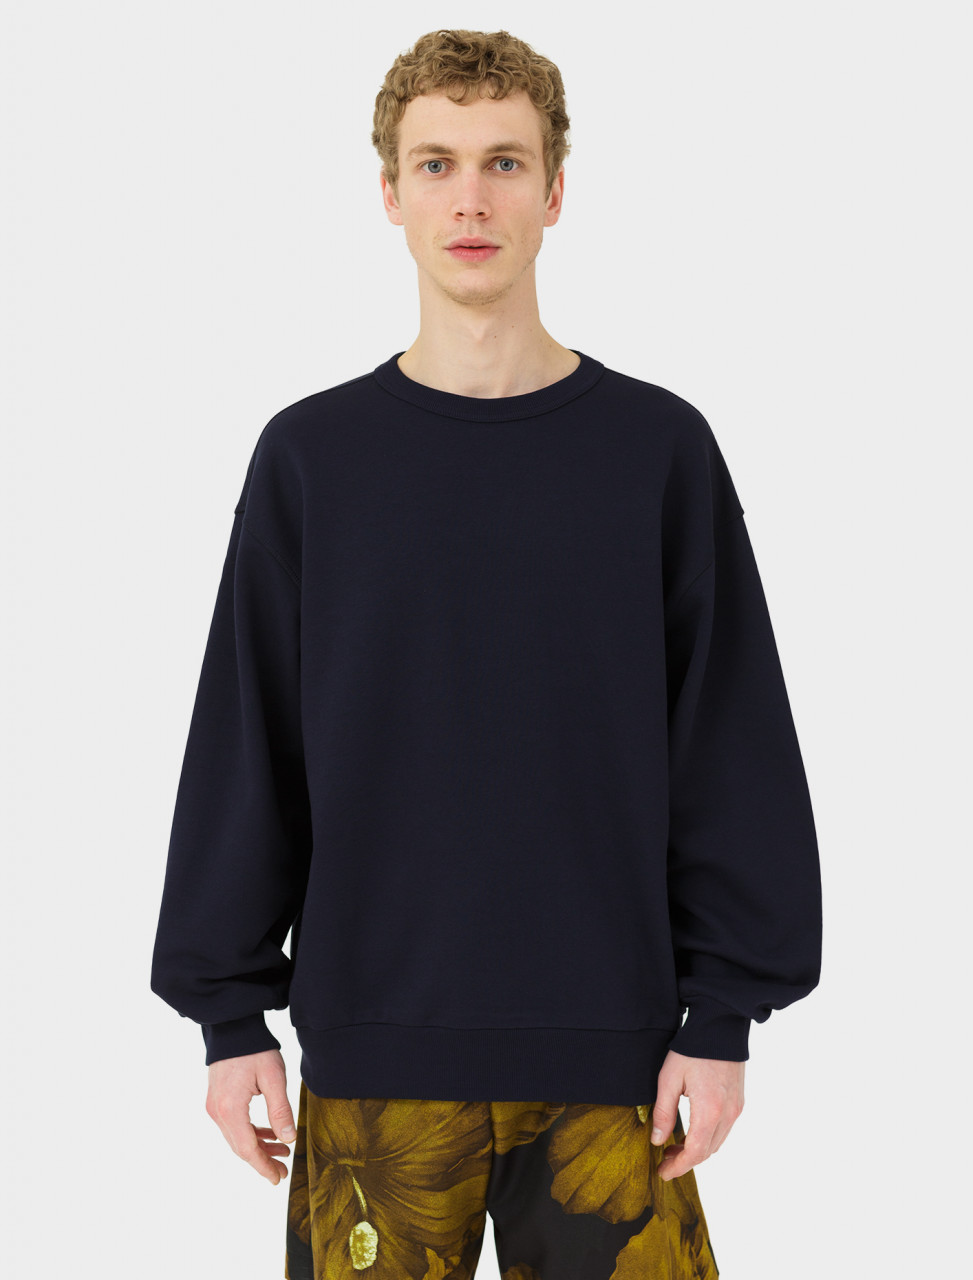 Hoxto Sweater